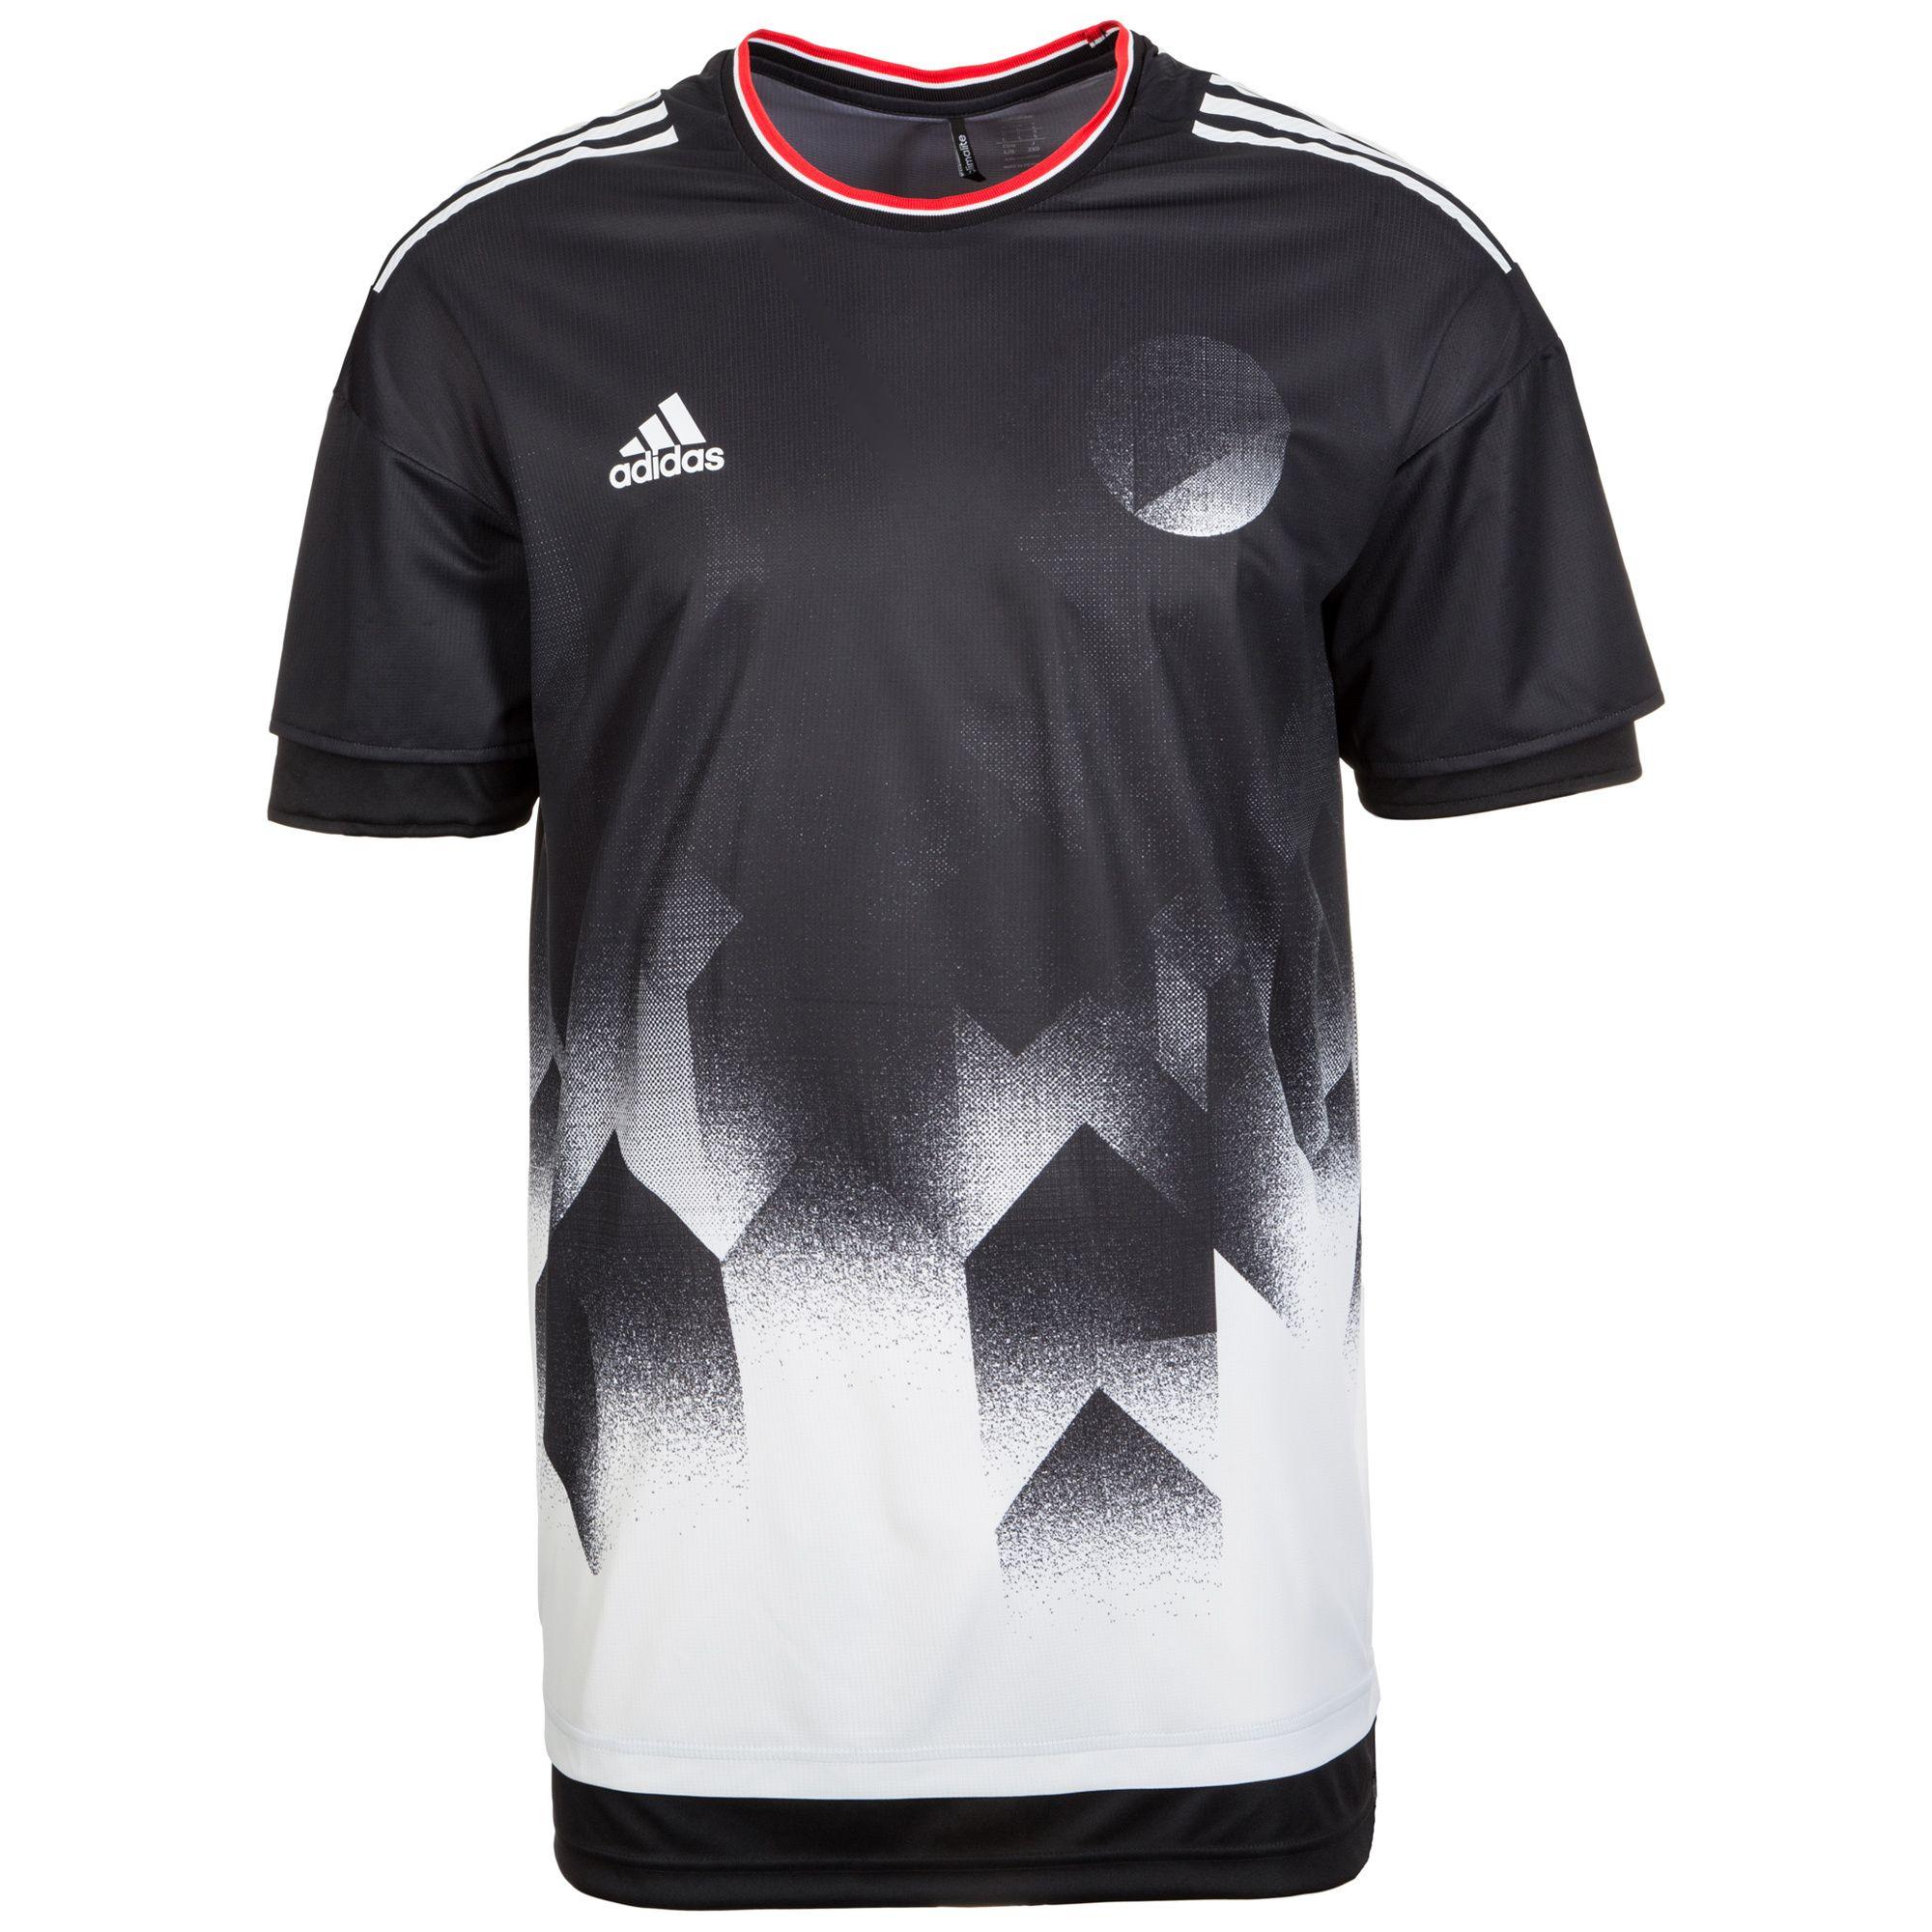 ADIDAS PERFORMANCE adidas Performance Tango Future Layered Fußballtrikot Herren